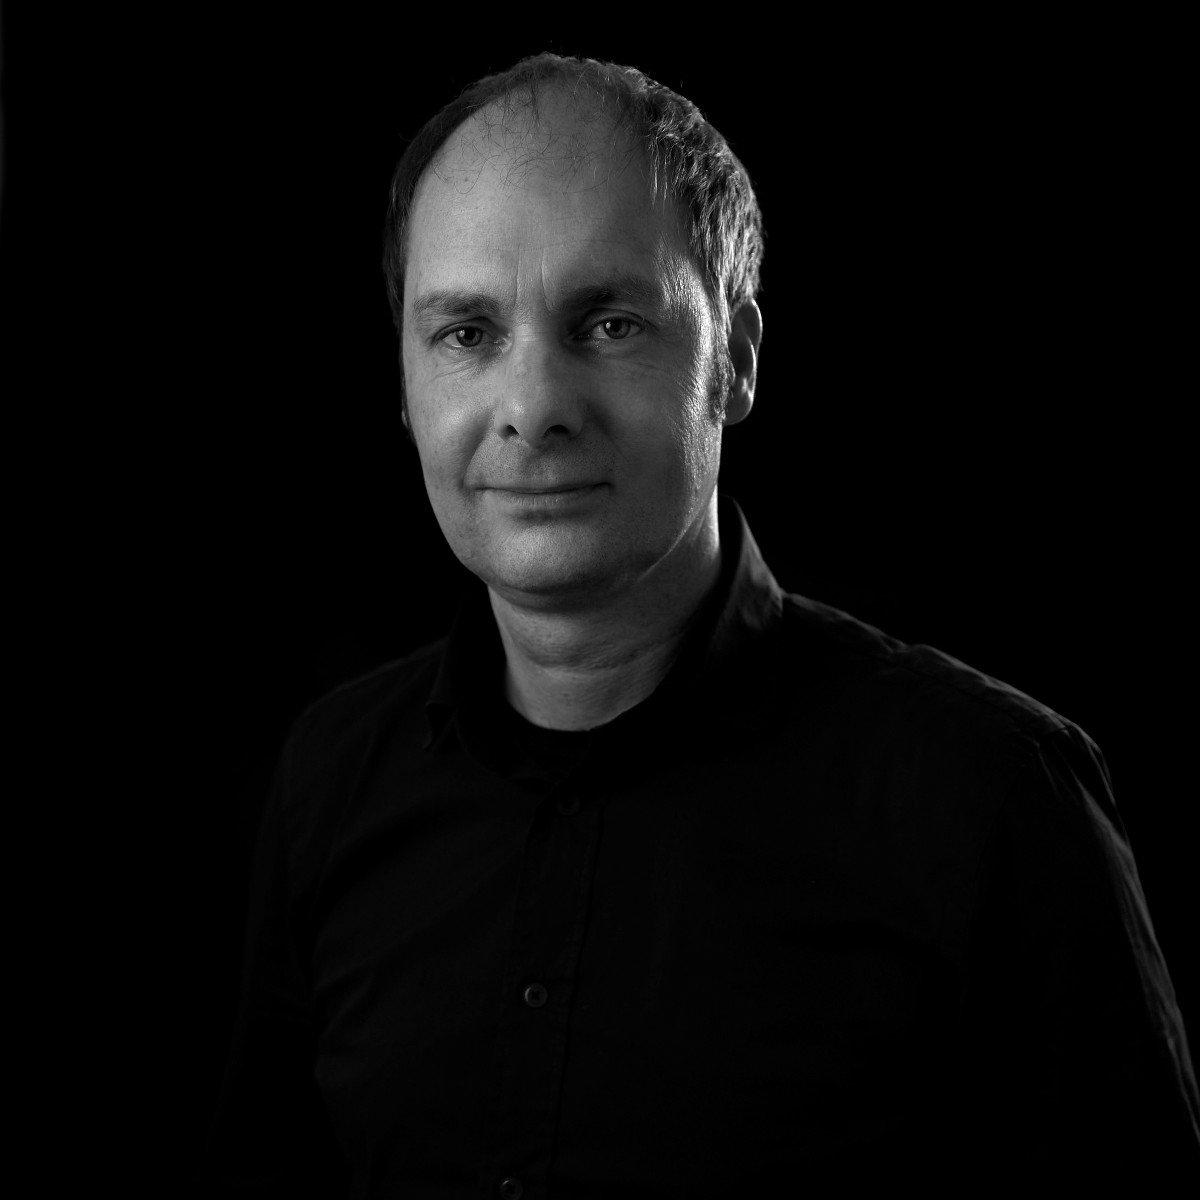 Thomas Krych